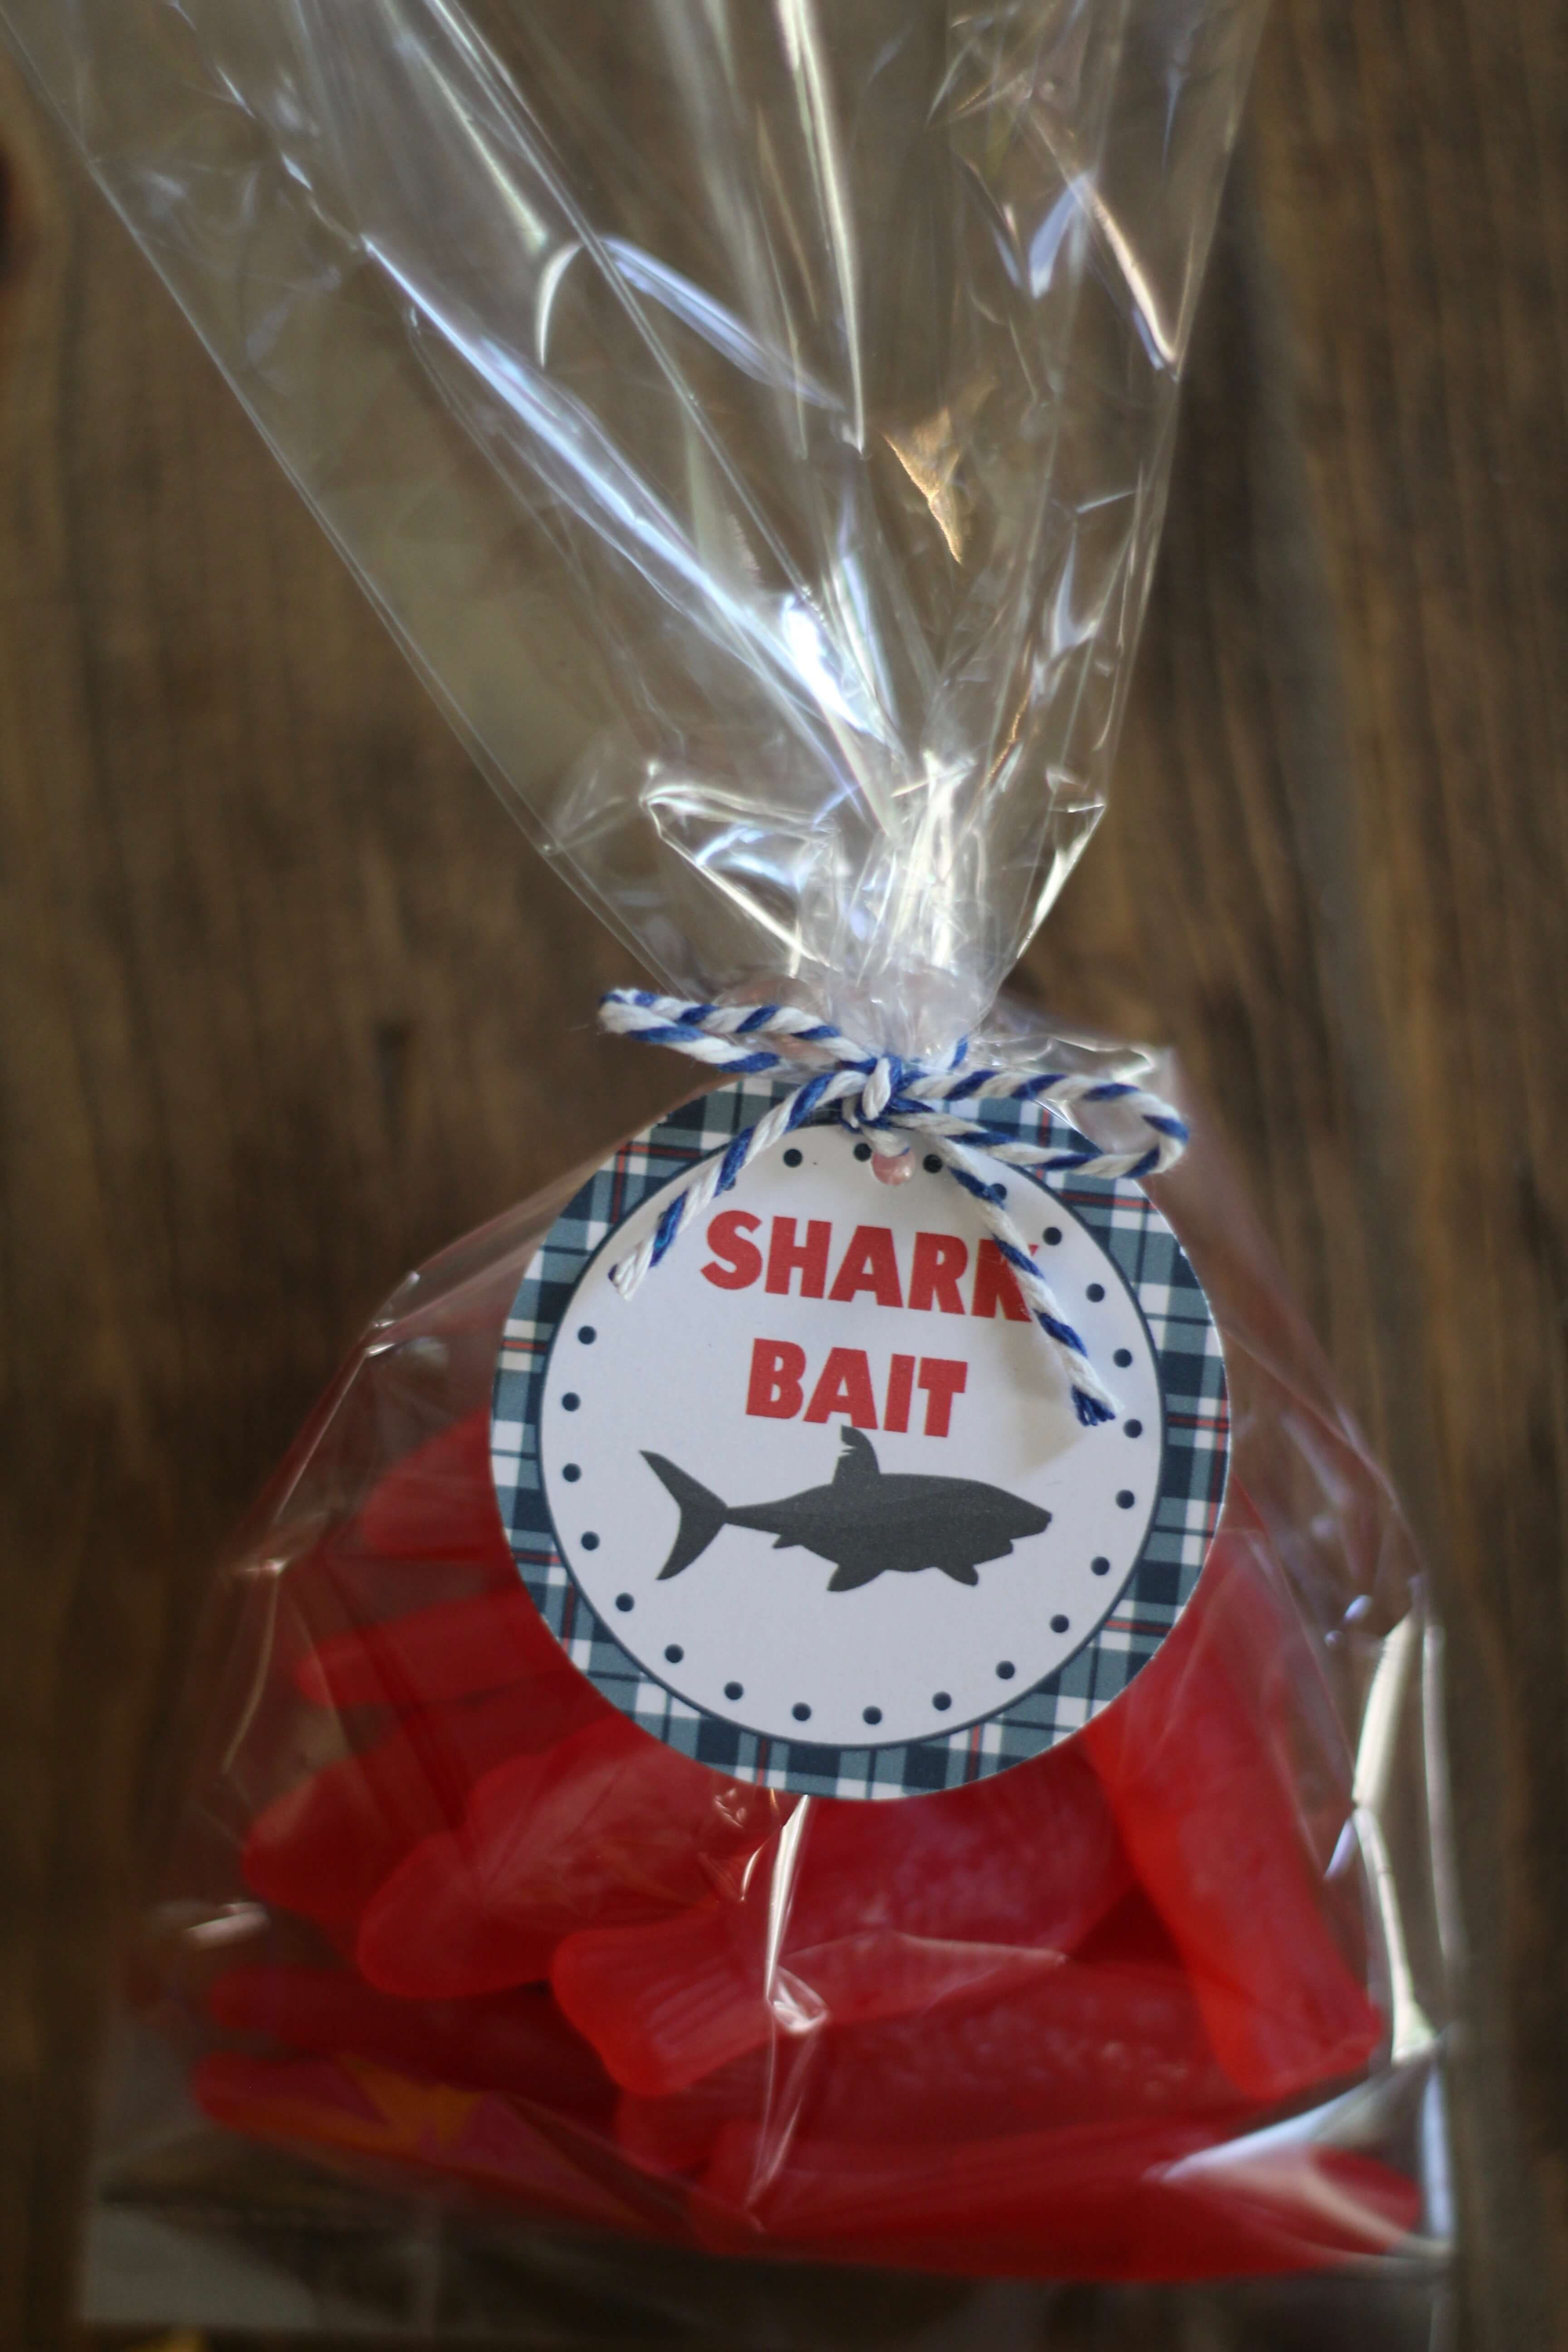 Shark Bait Free Printable Tags   Shark bait, Printable tags and Bait